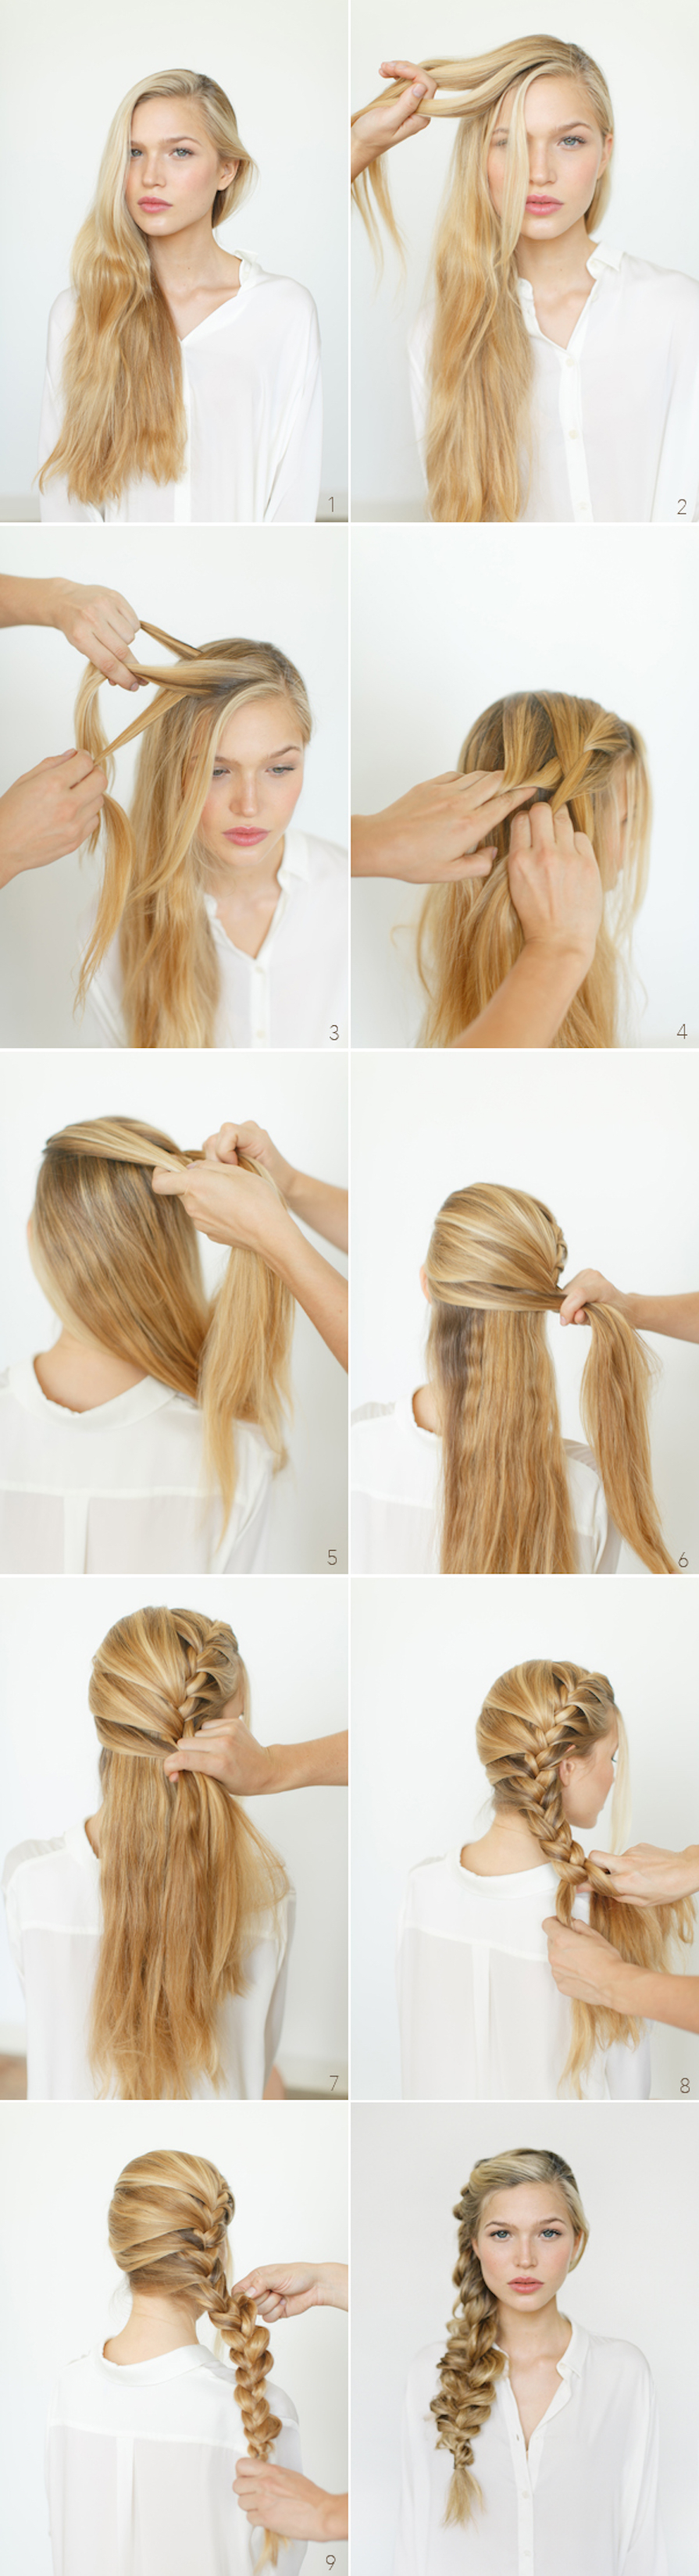 penteados-tutoriais-de-natal-danielle-noce-3